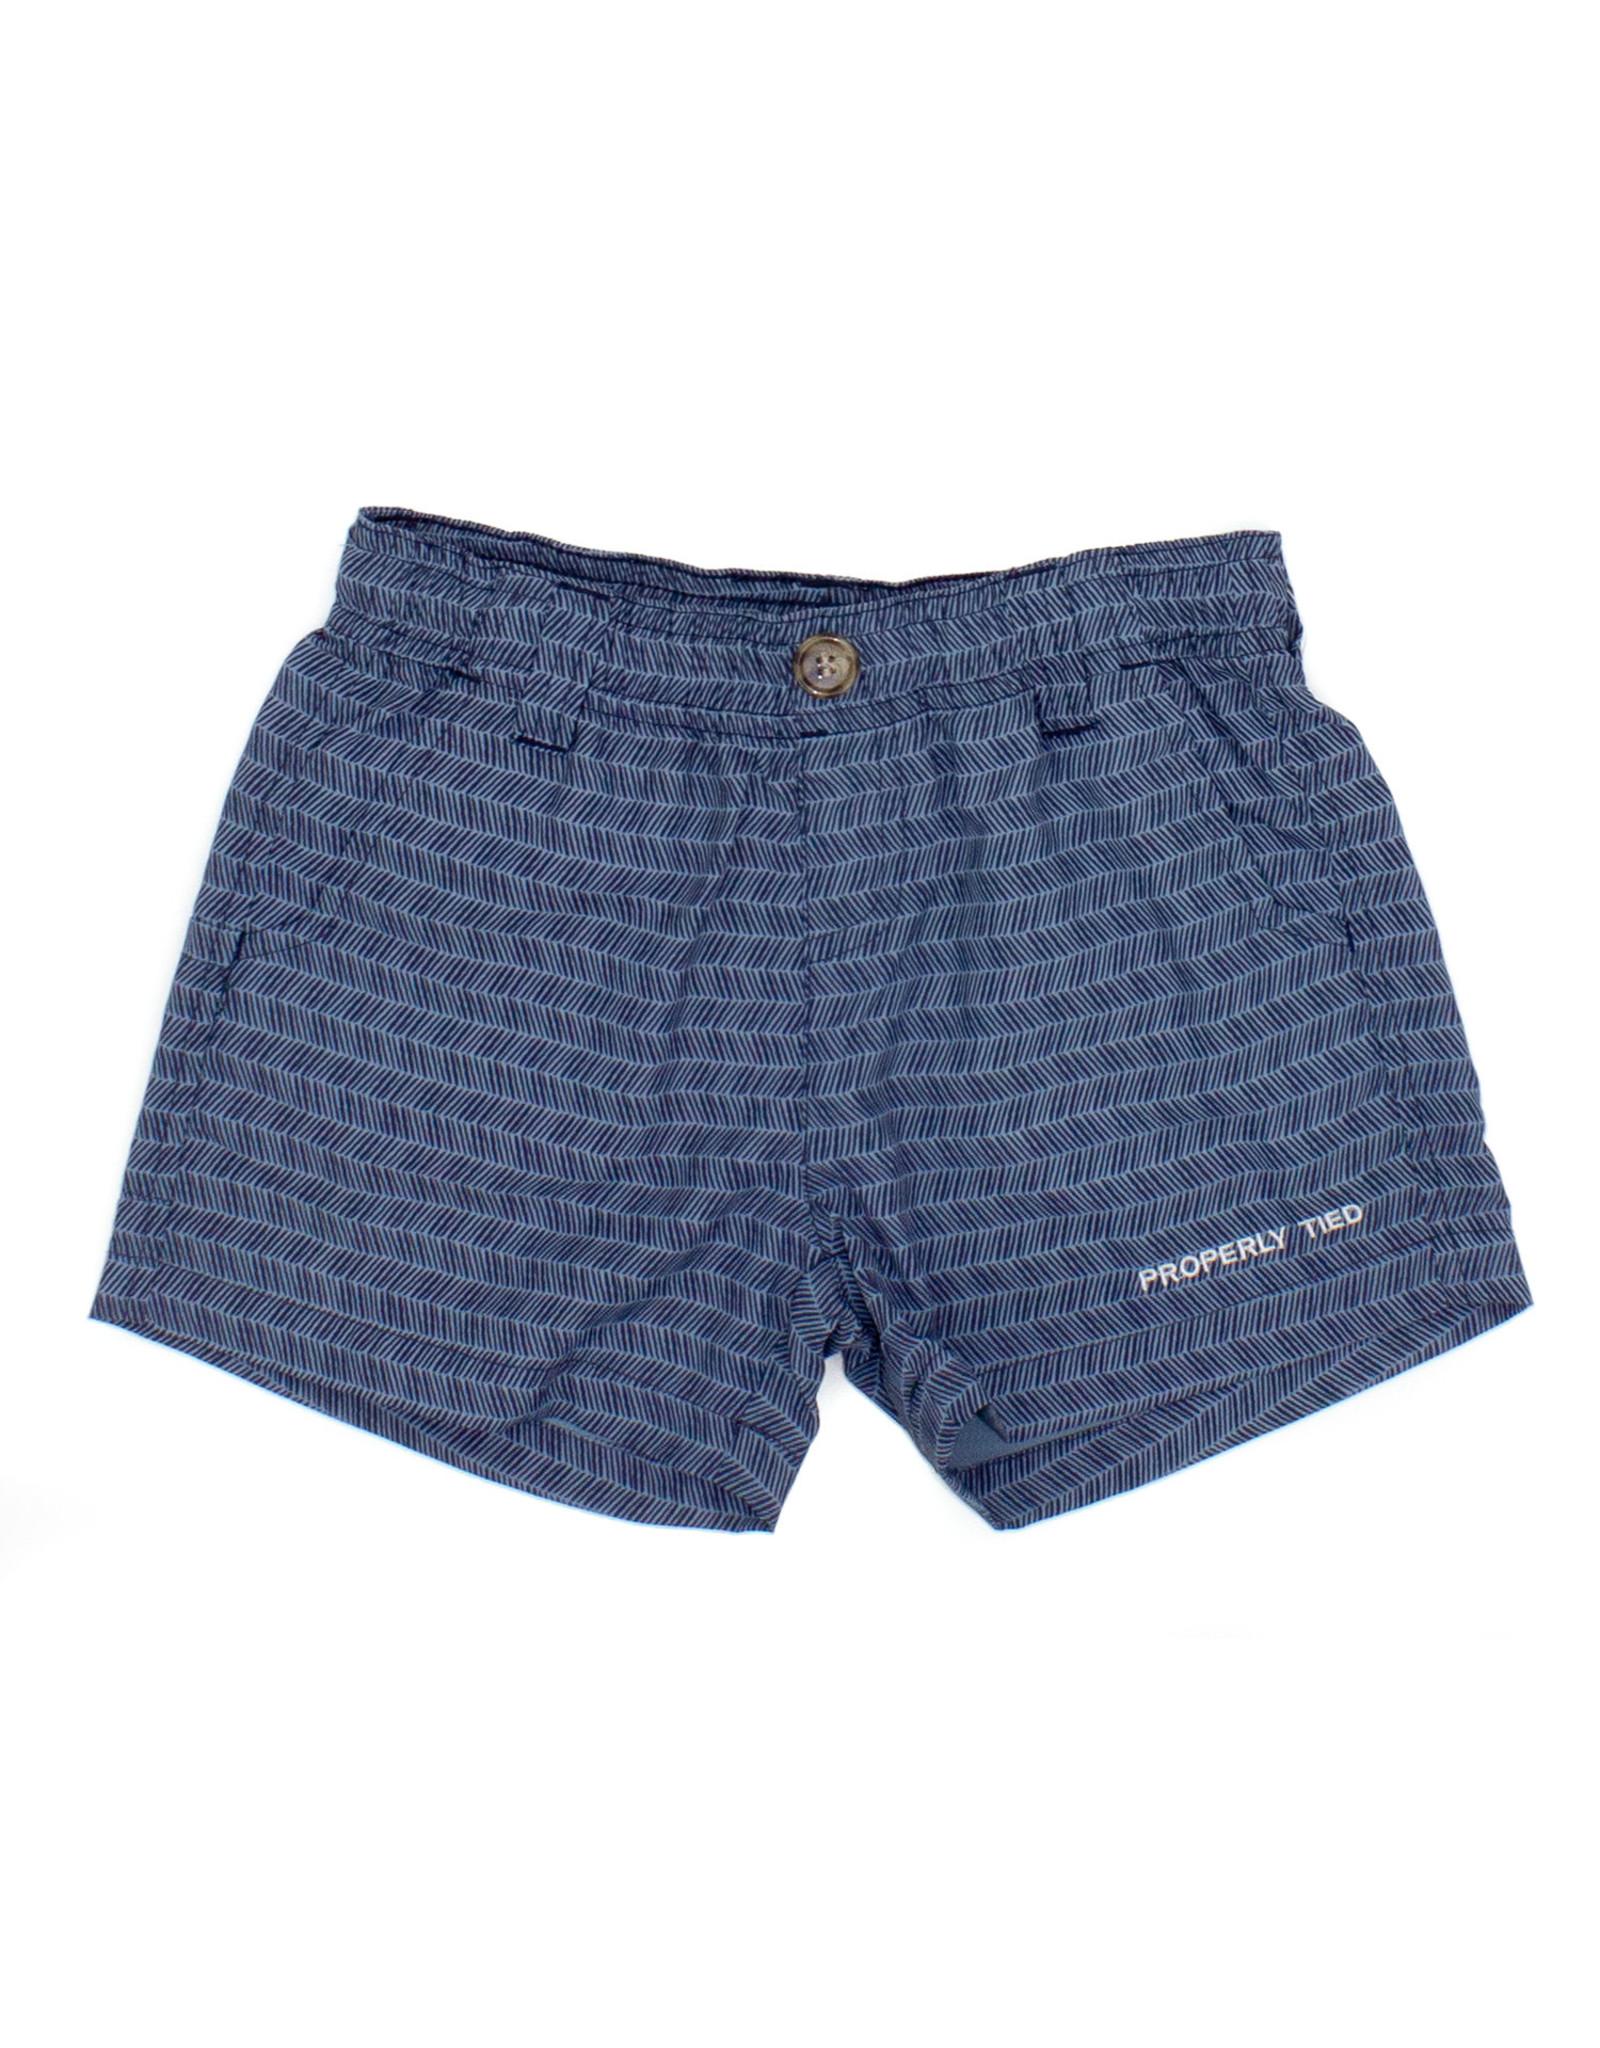 Properly Tied Mallard Shorts, Tiki